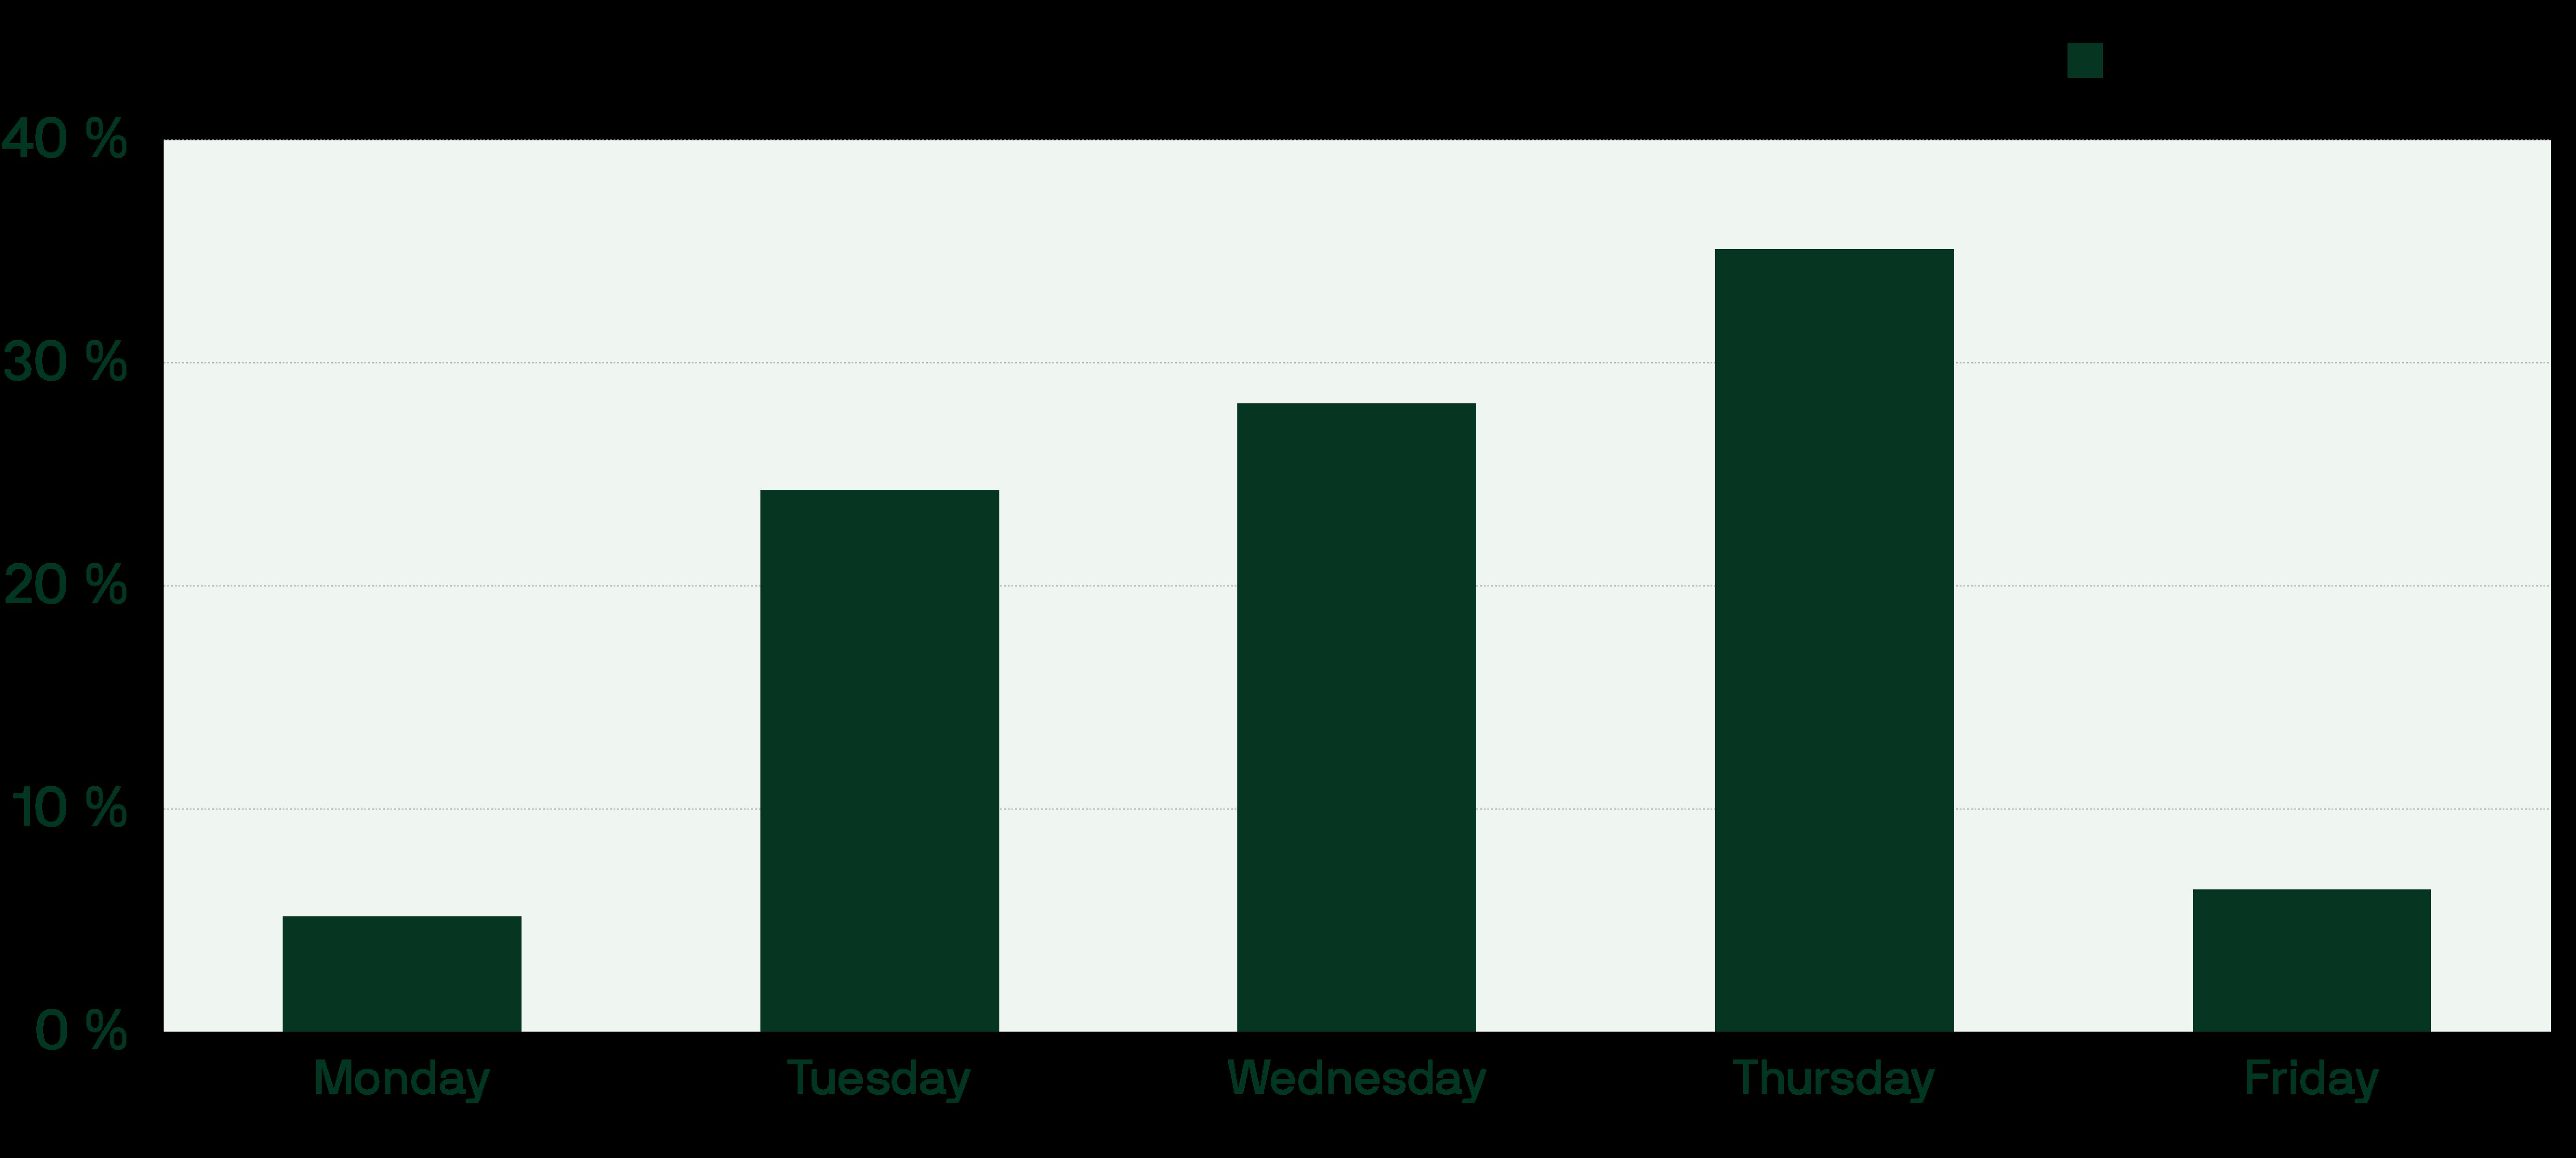 Webinar Day of the week